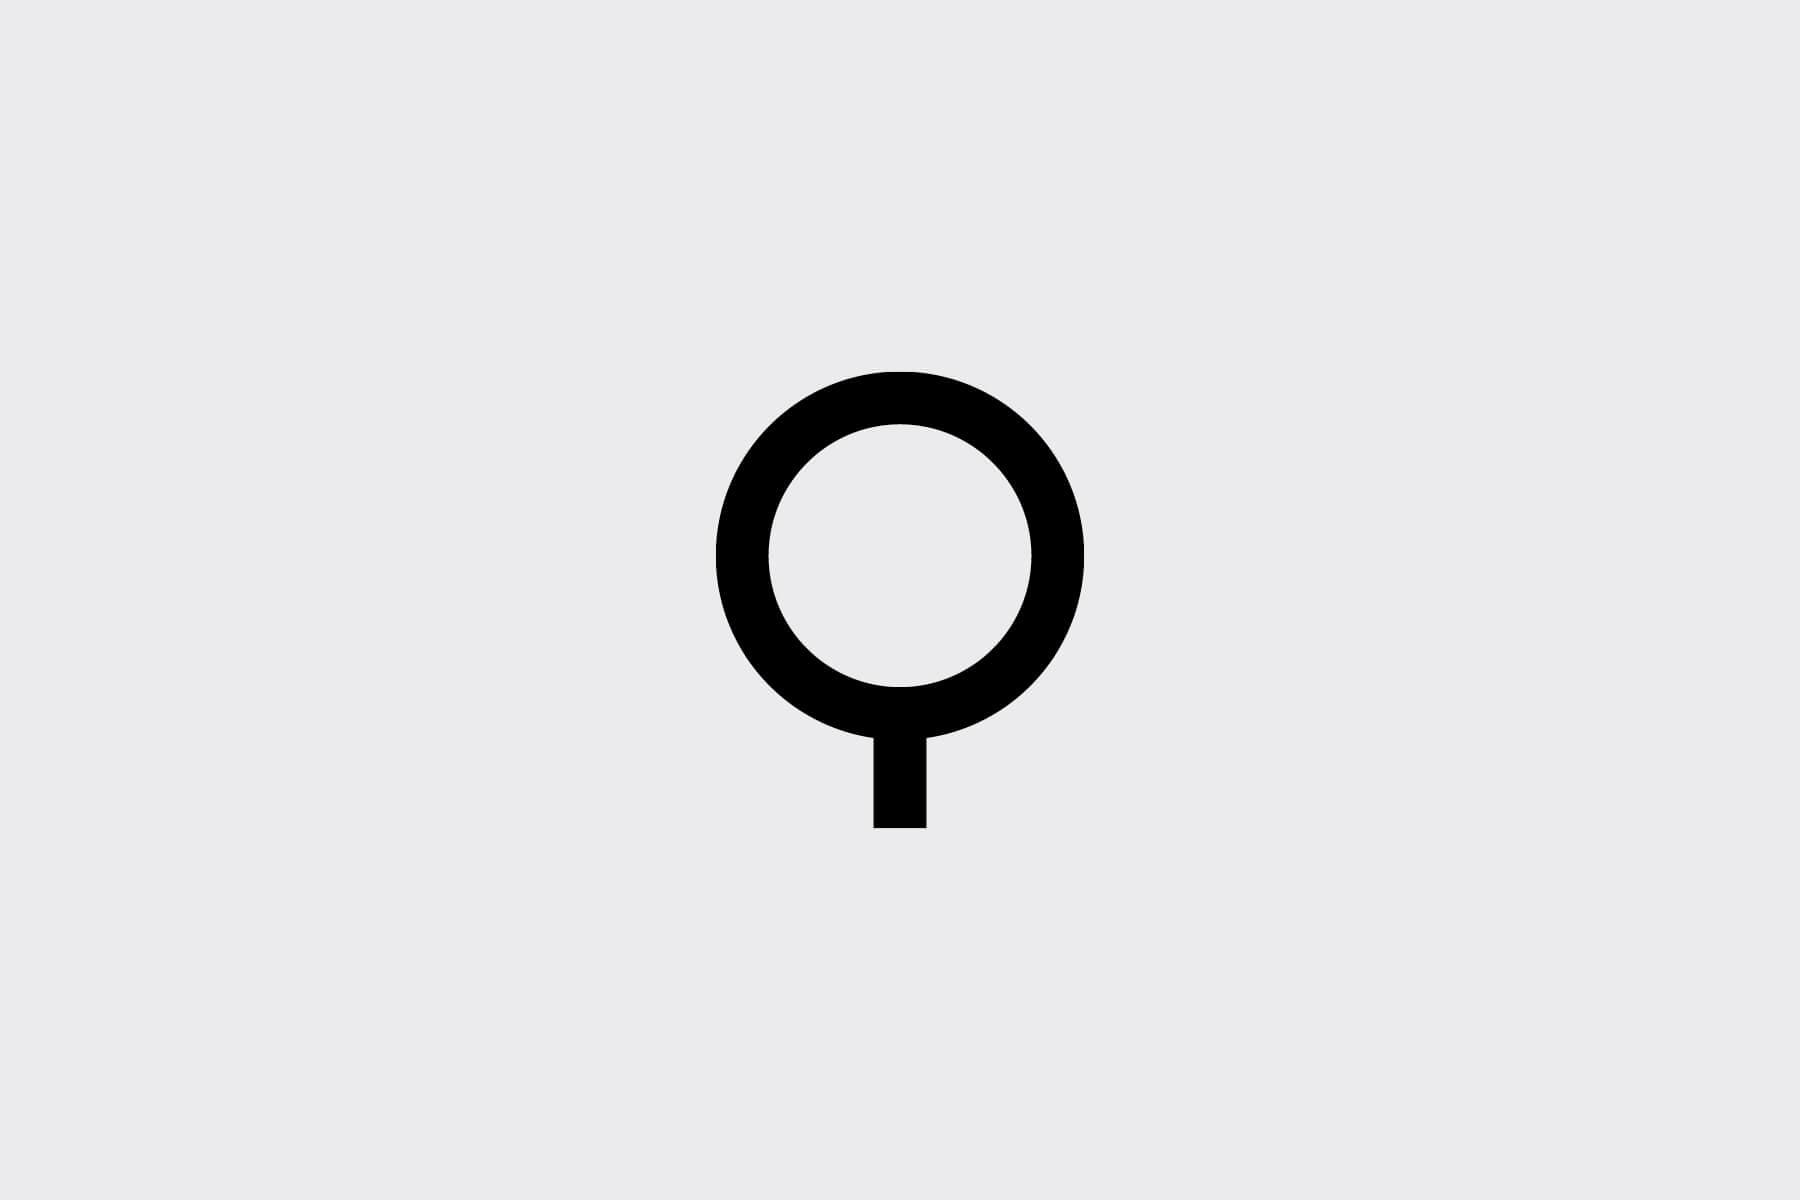 grafikdesign-janis-weidner-lindau-bodensee-logo-01